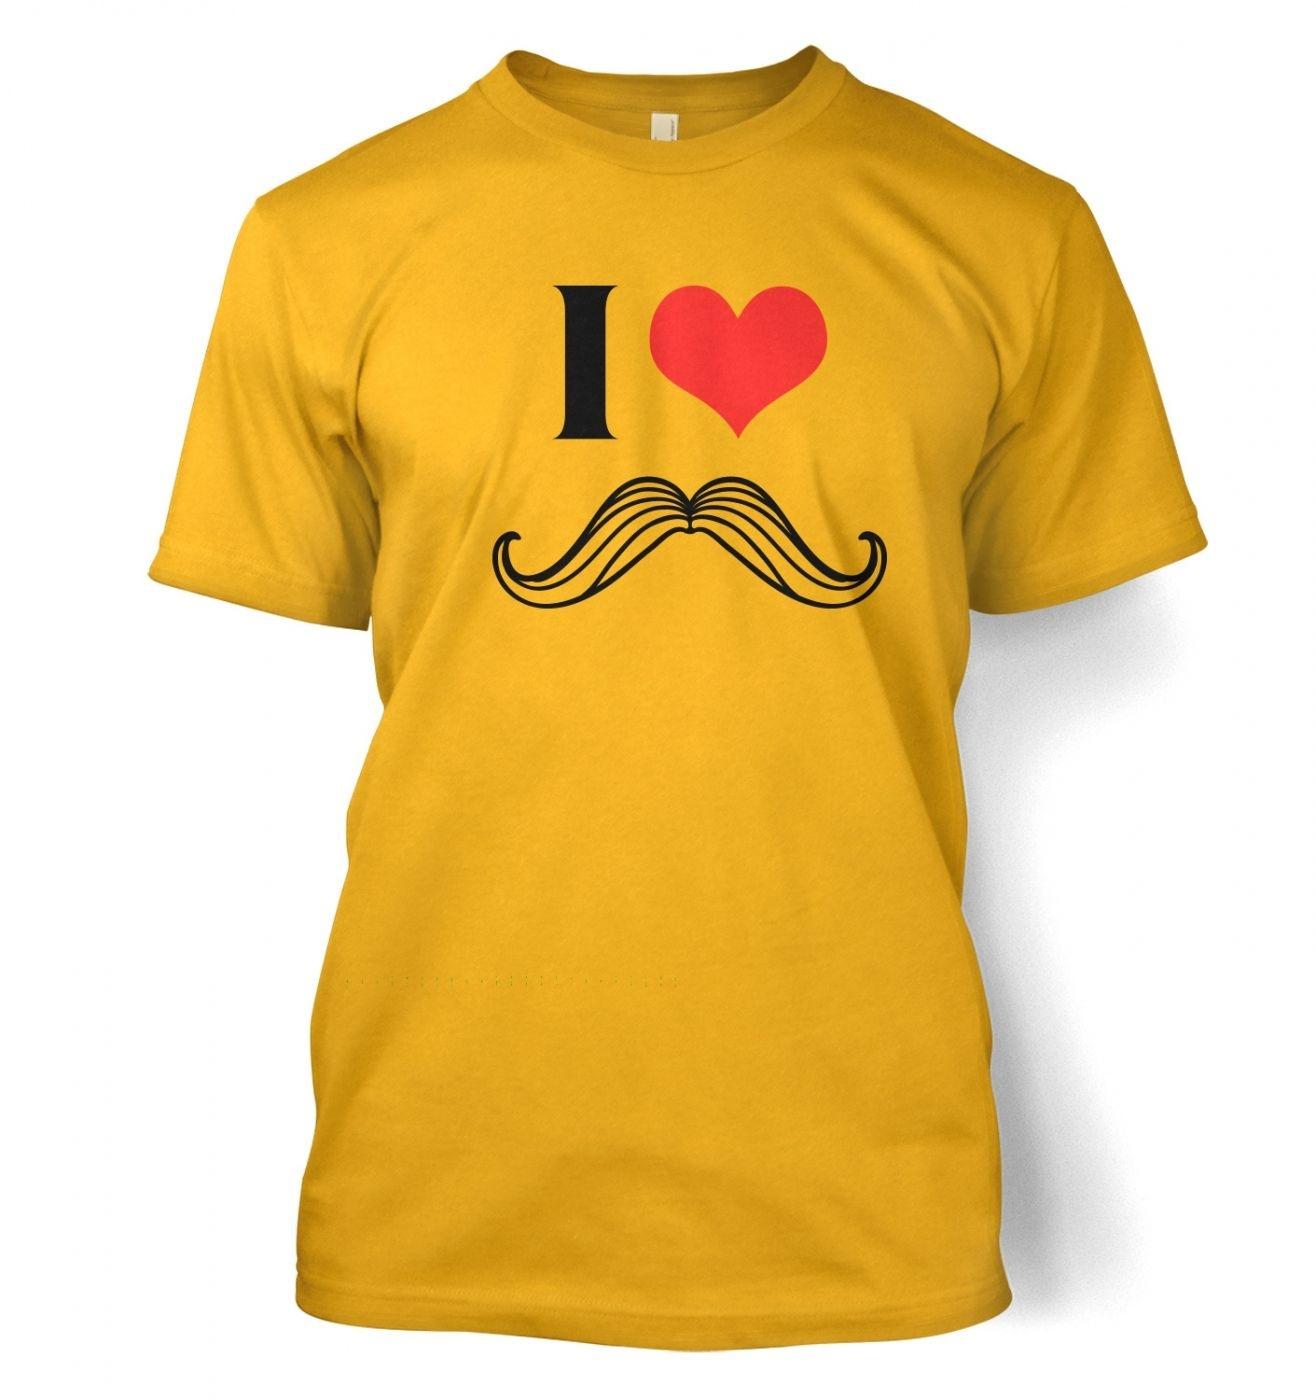 I heart moustache t-shirt